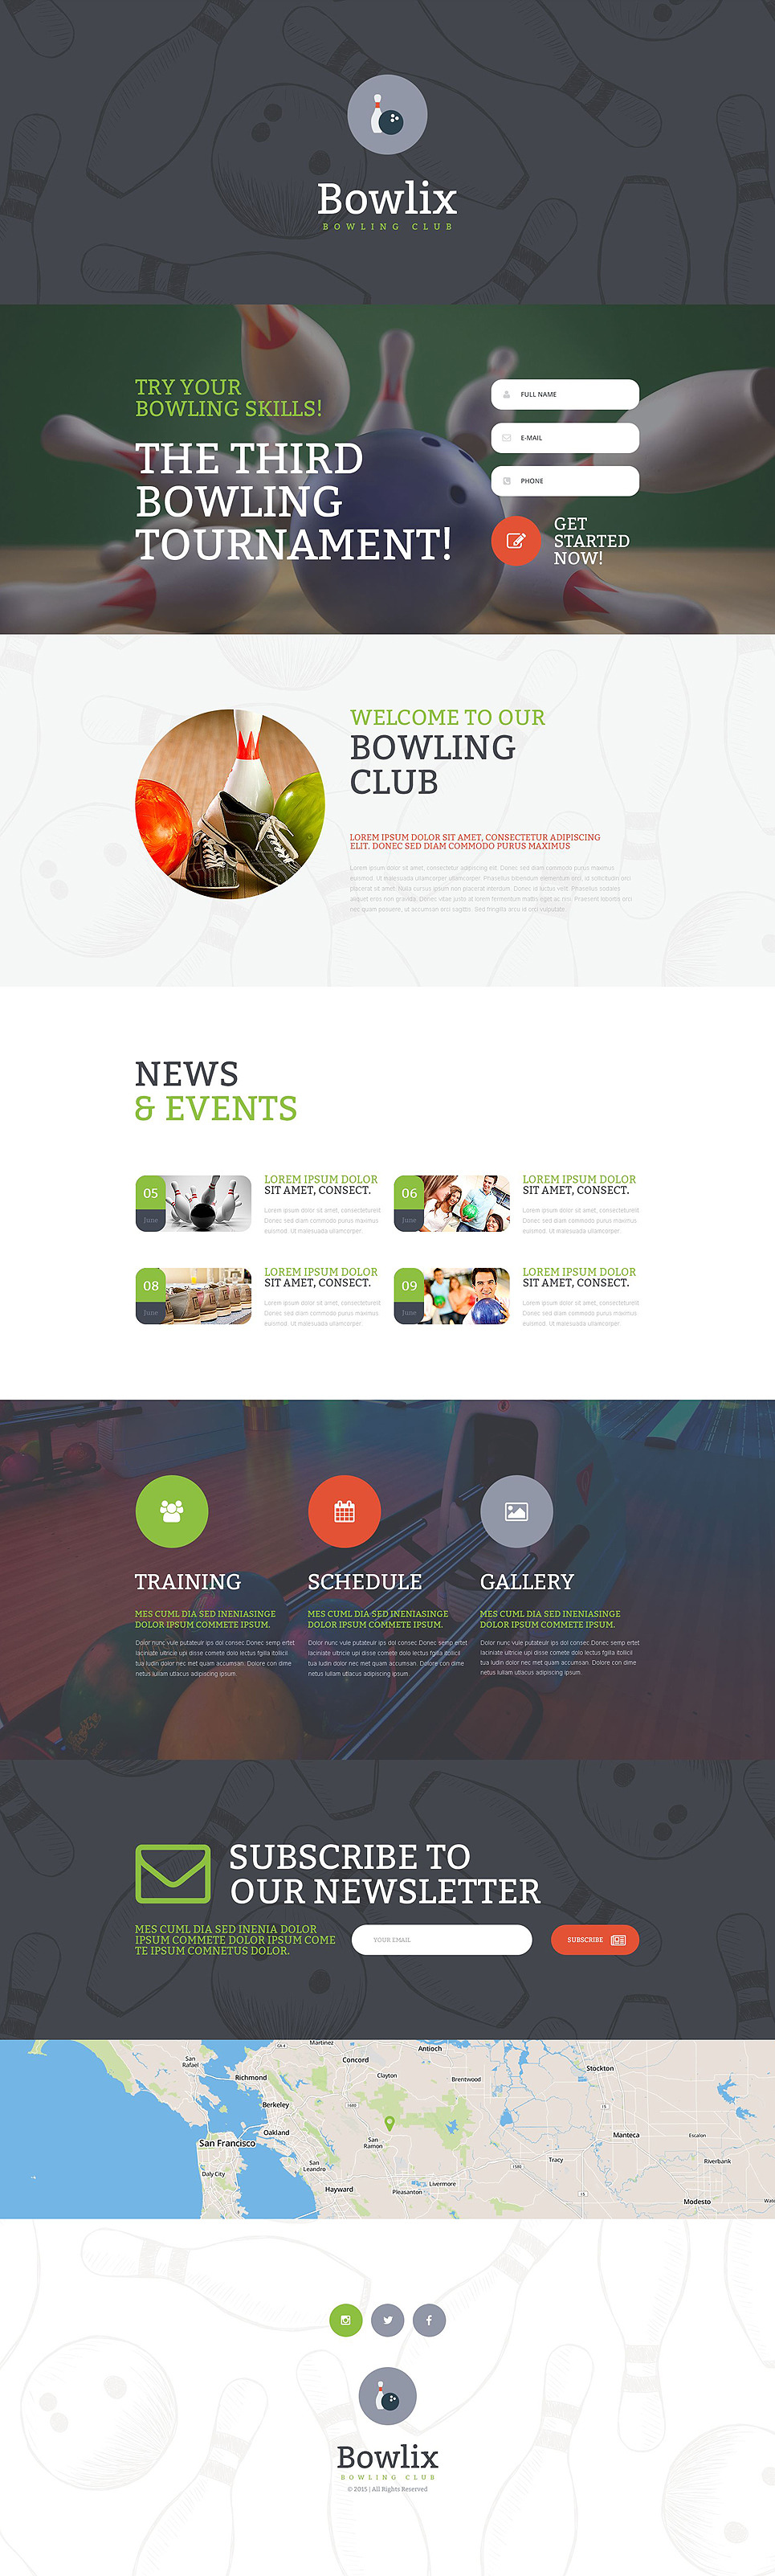 Bowling Responsive Landing Page Template New Screenshots BIG